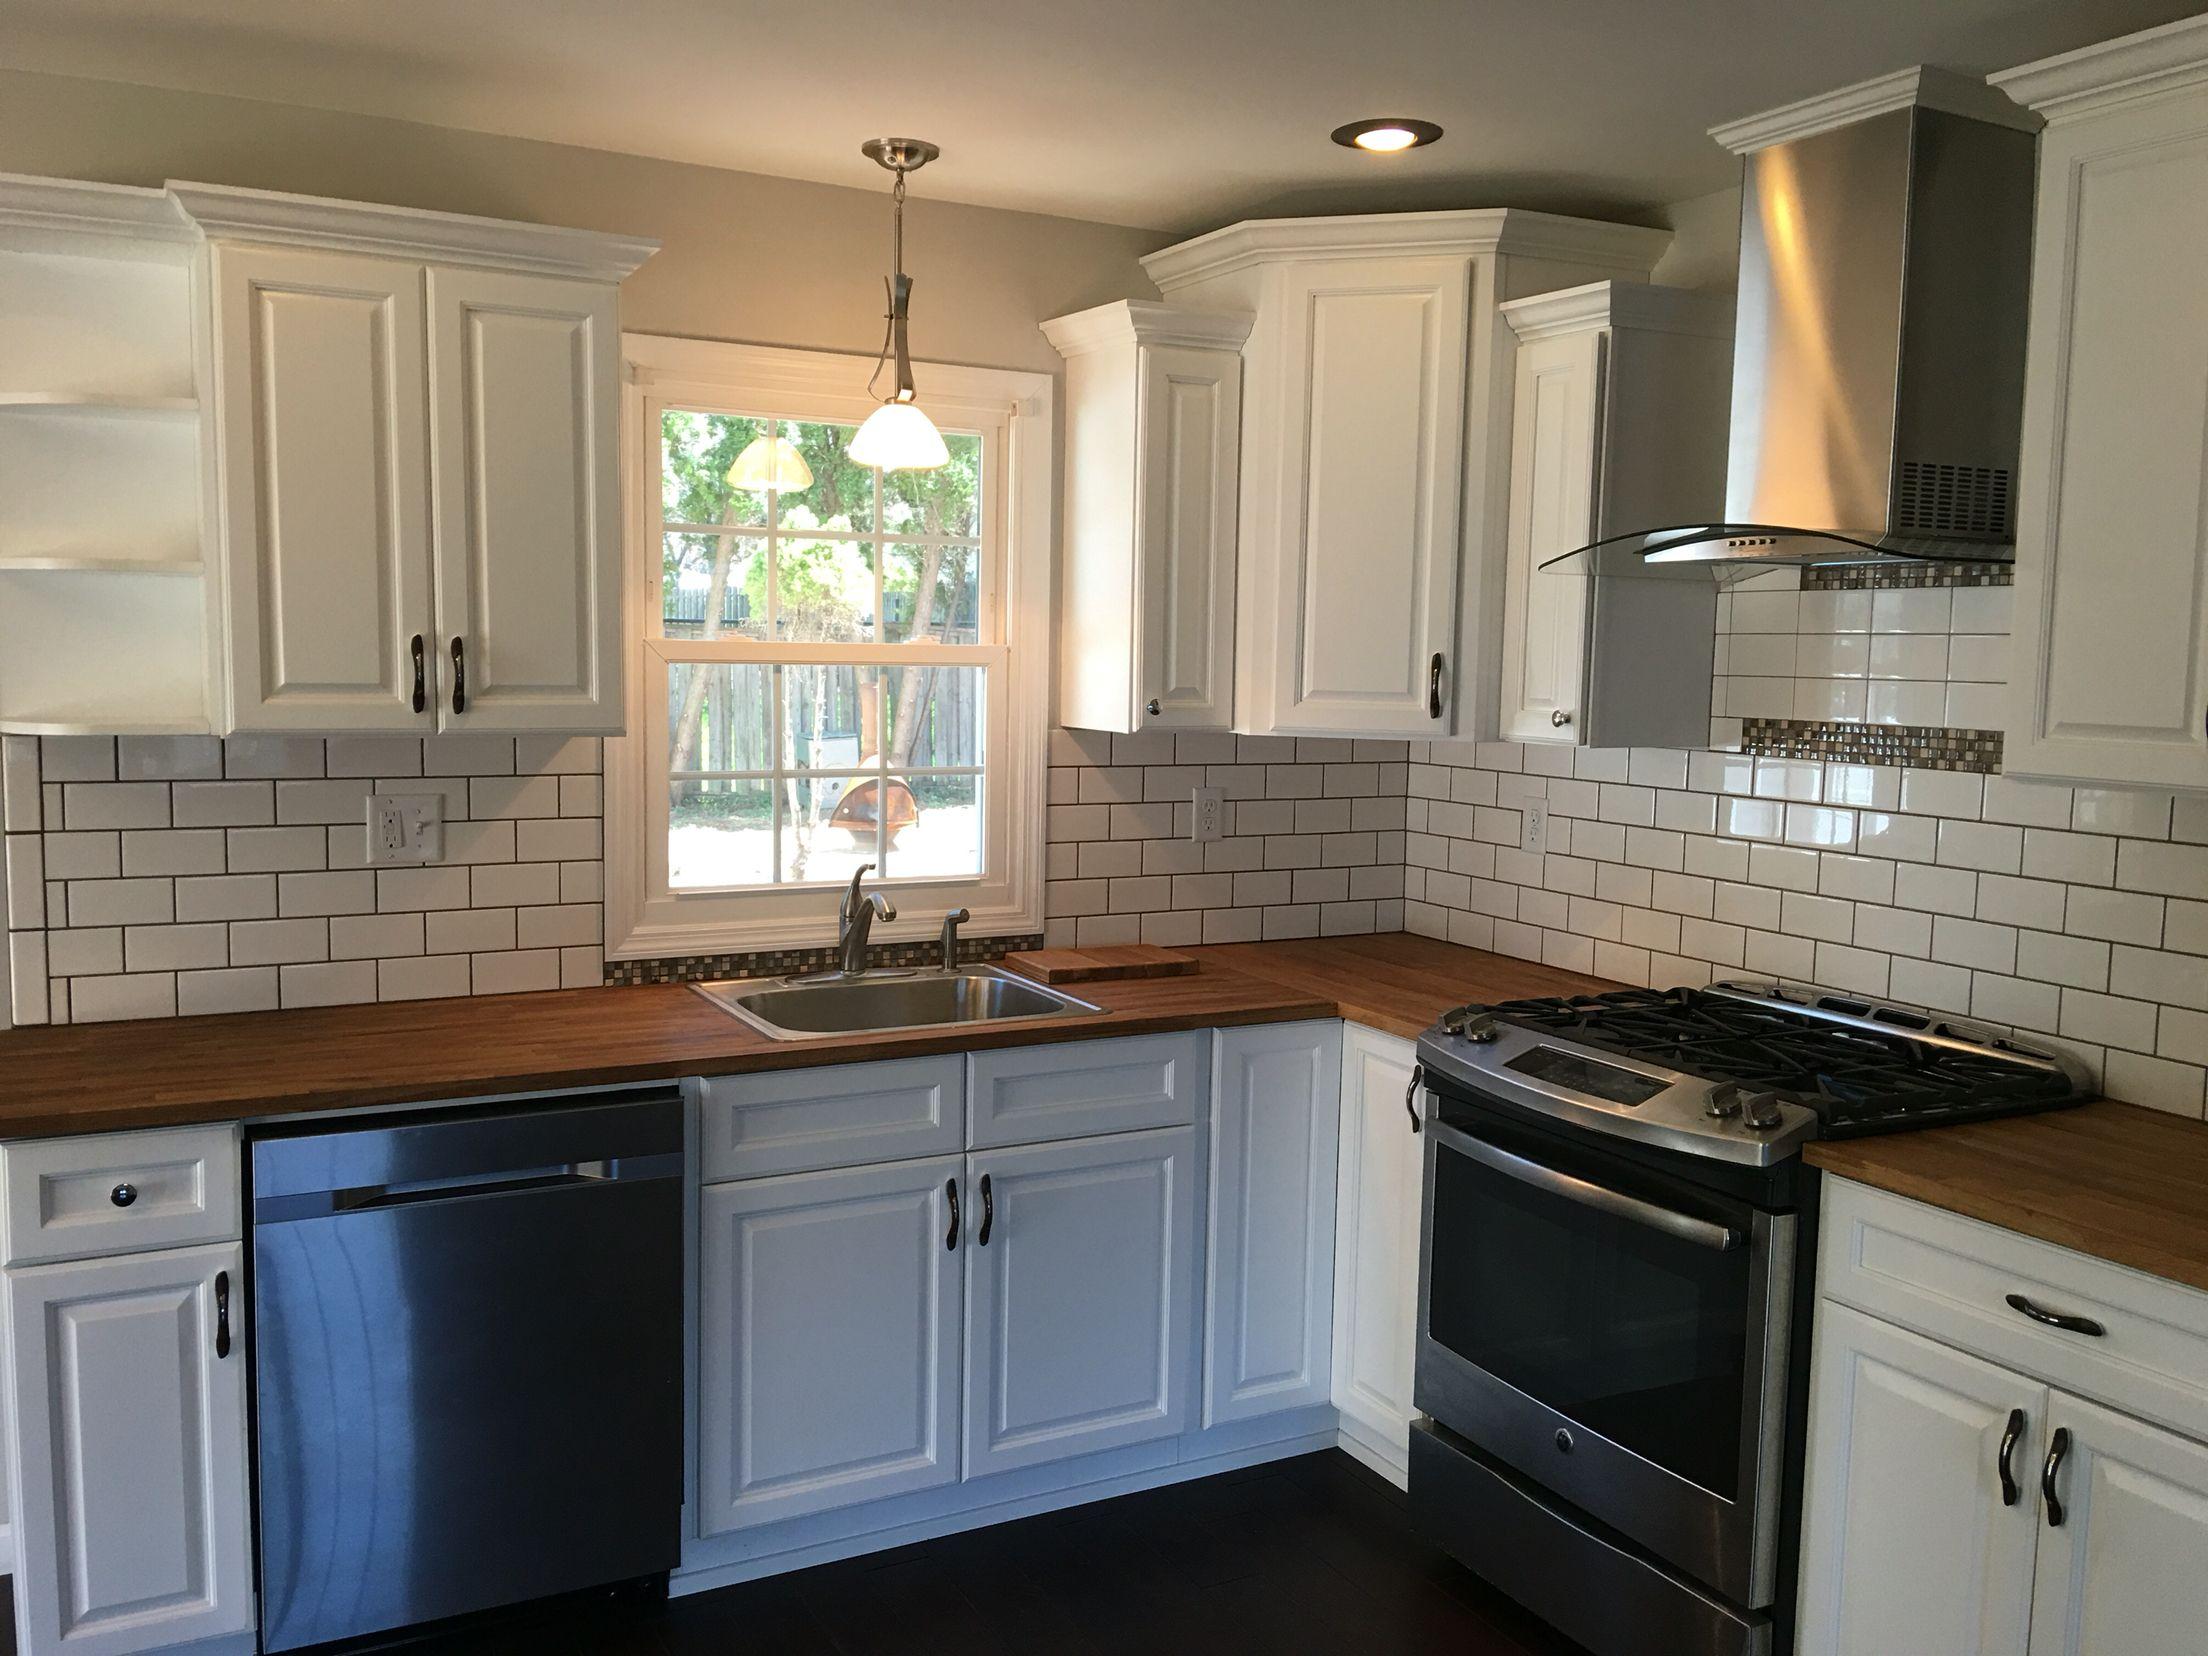 Fabuwood Hallmark Frost Kitchen Remodelingbart Design And Delectable Remodeling Kitchen Inspiration Design